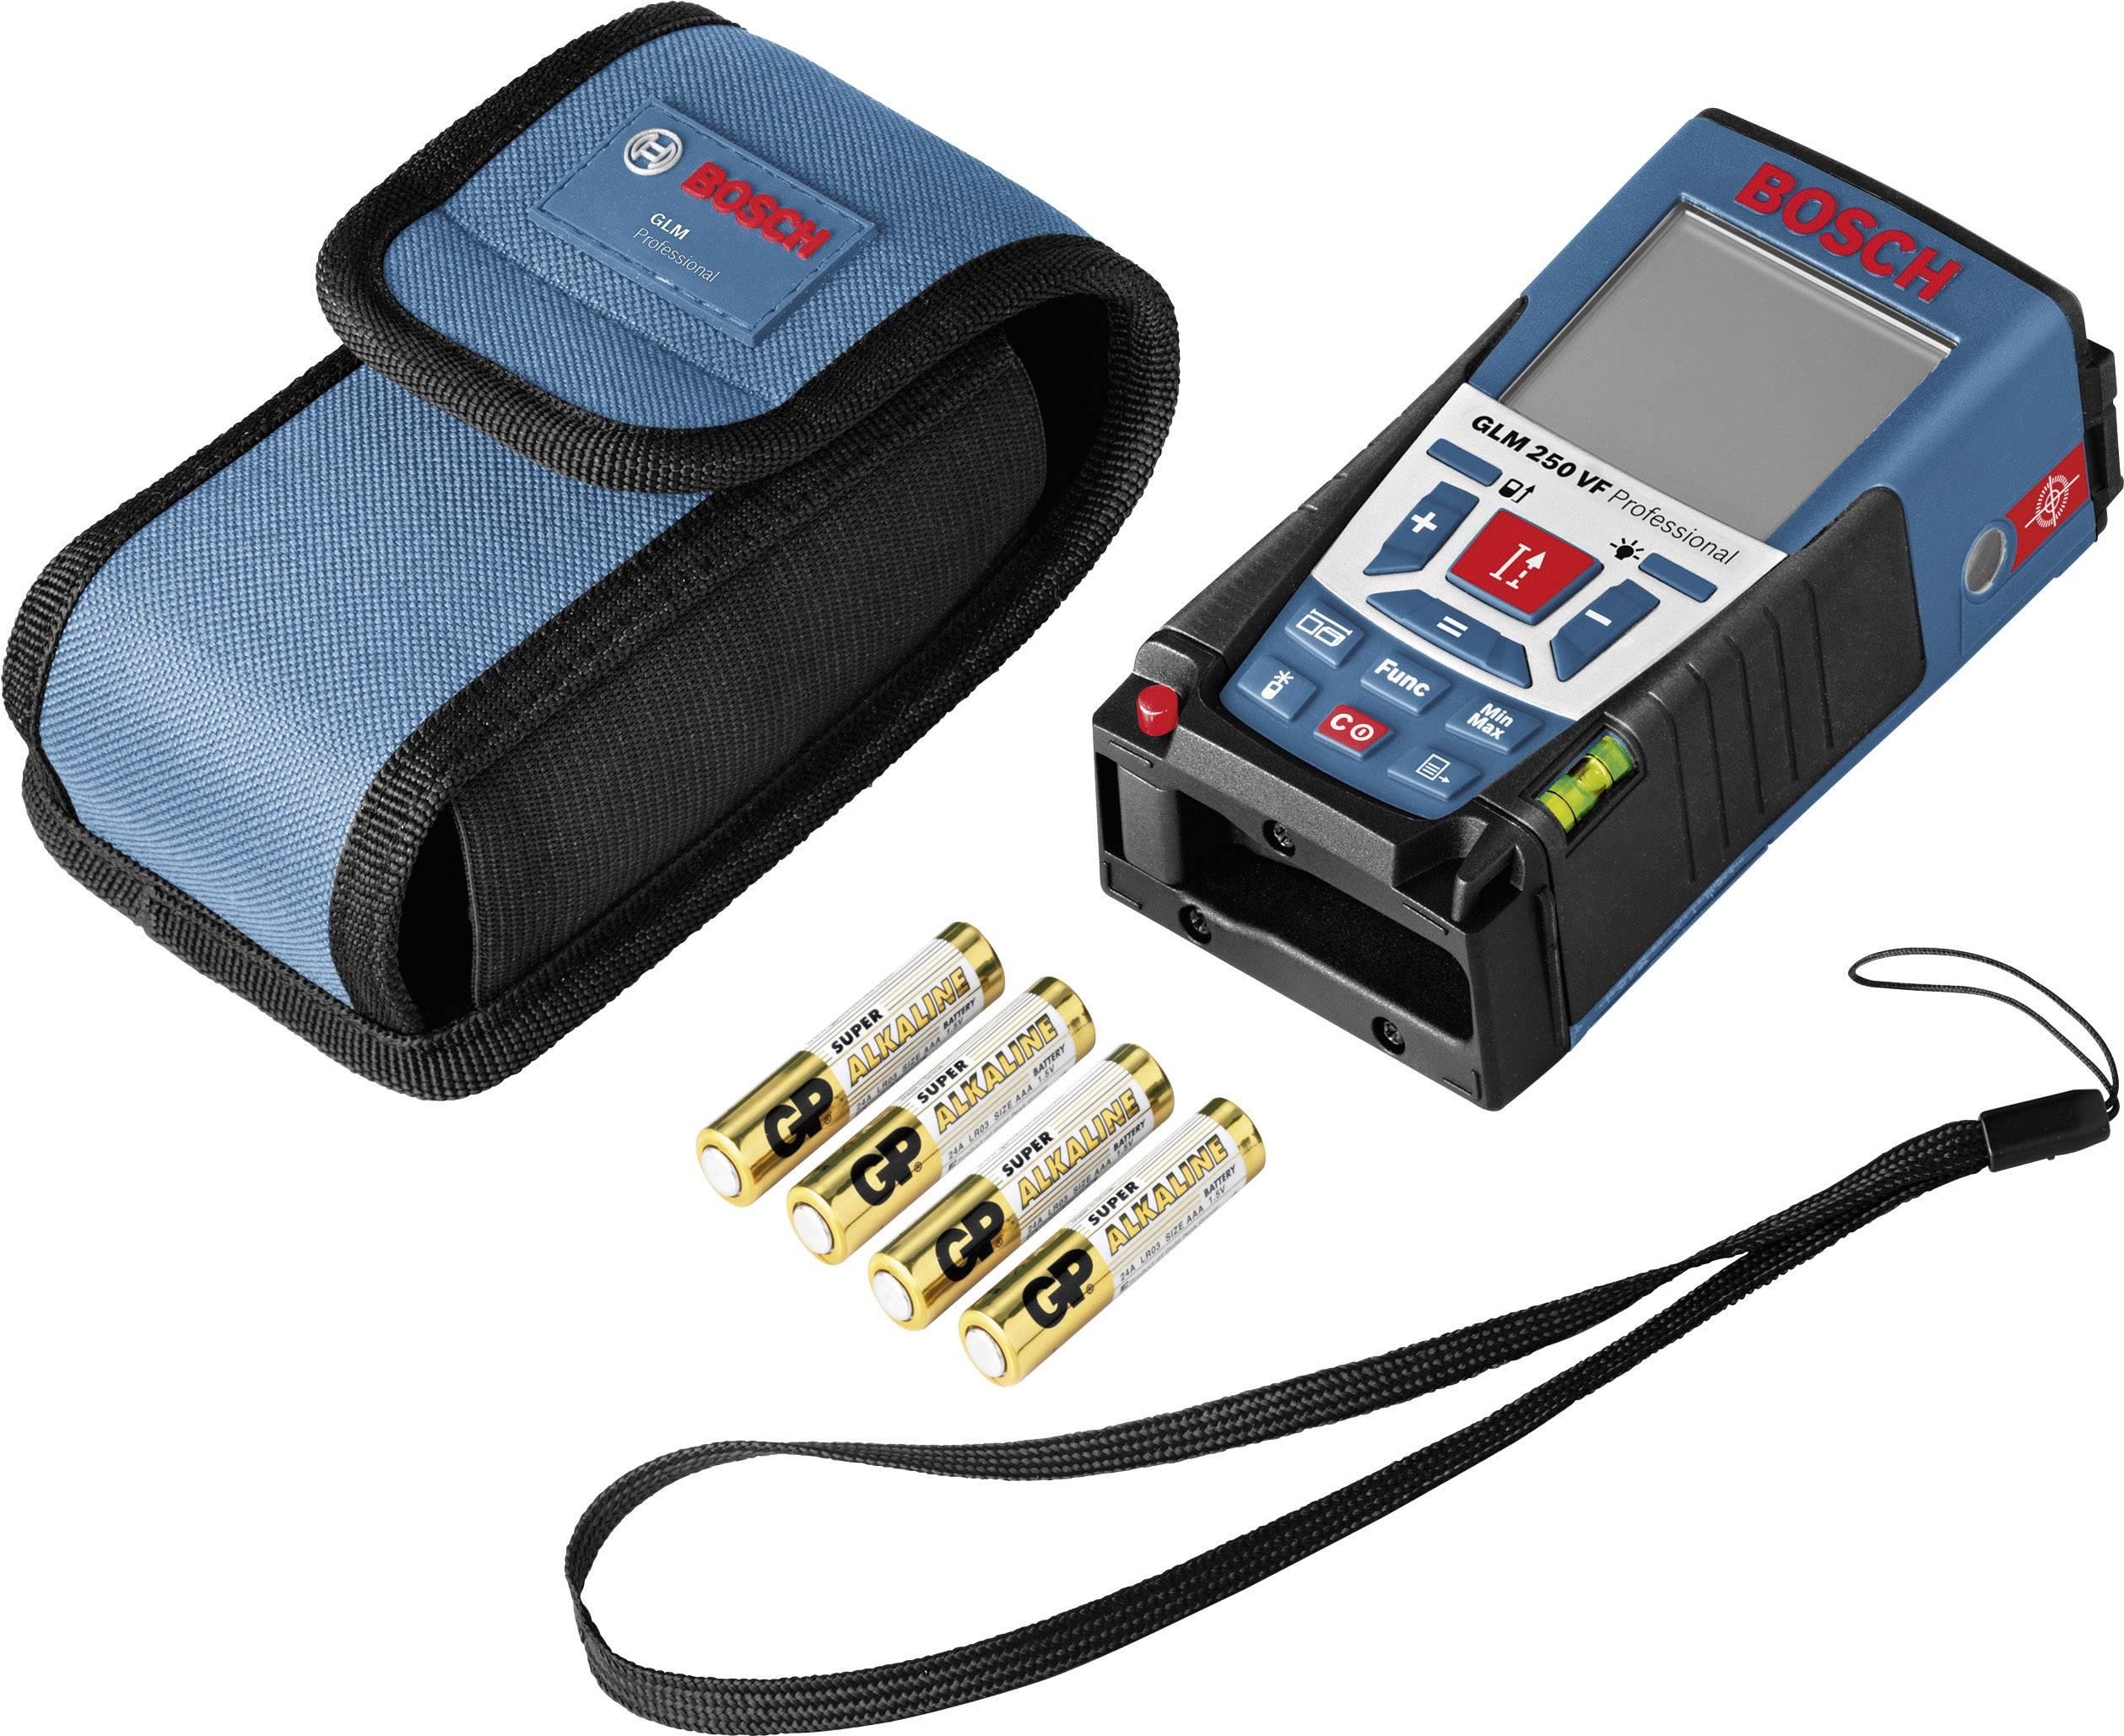 Bosch Entfernungsmesser Neu : Bosch professional glm vf laser entfernungsmesser